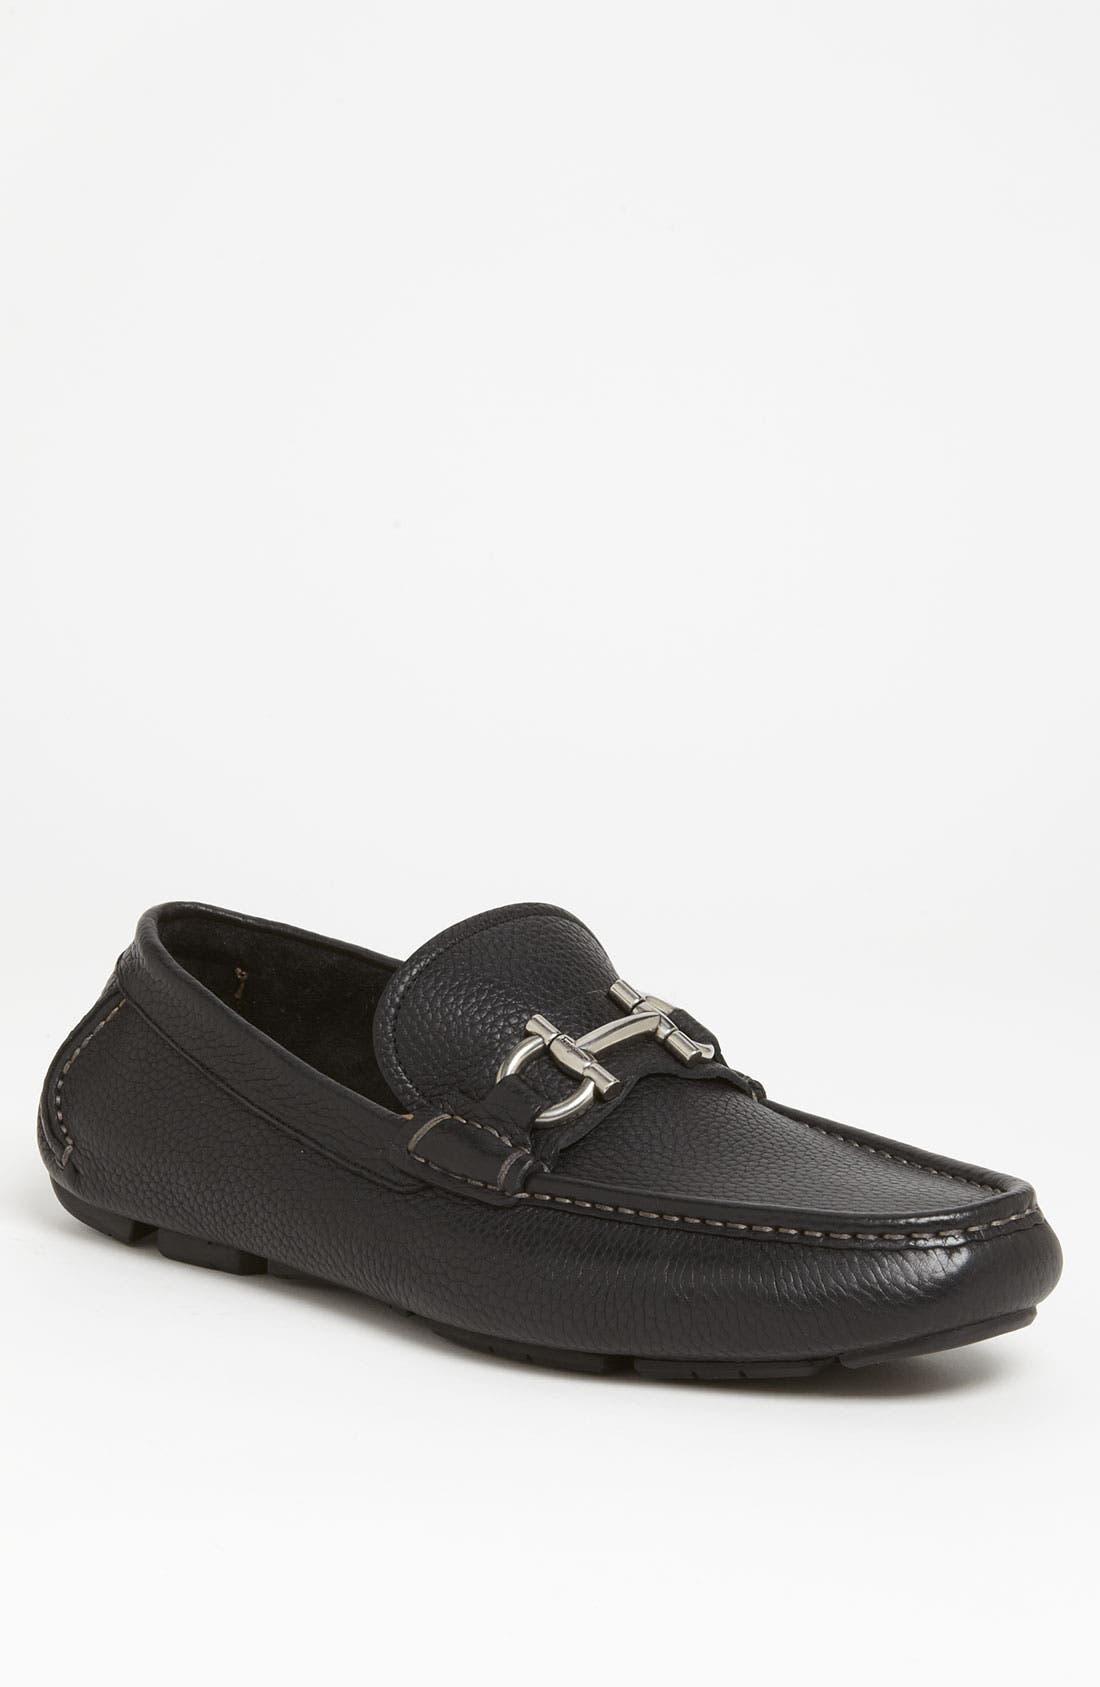 Alternate Image 1 Selected - Salvatore Ferragamo 'Daverio' Driving Shoe (Men)